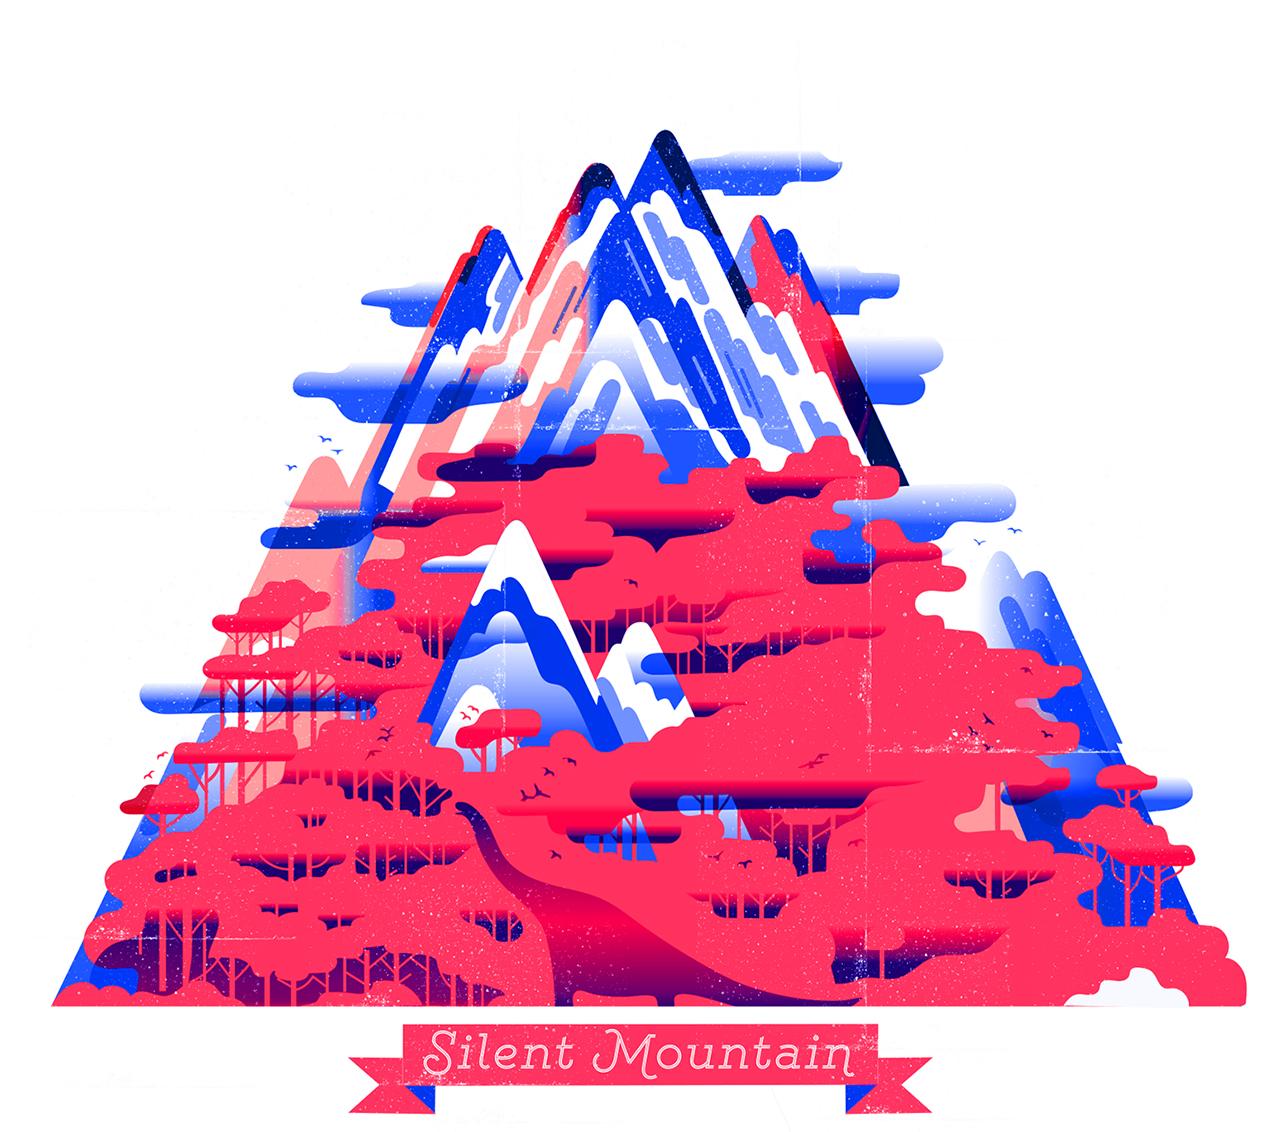 Silent mountain in prog.jpg